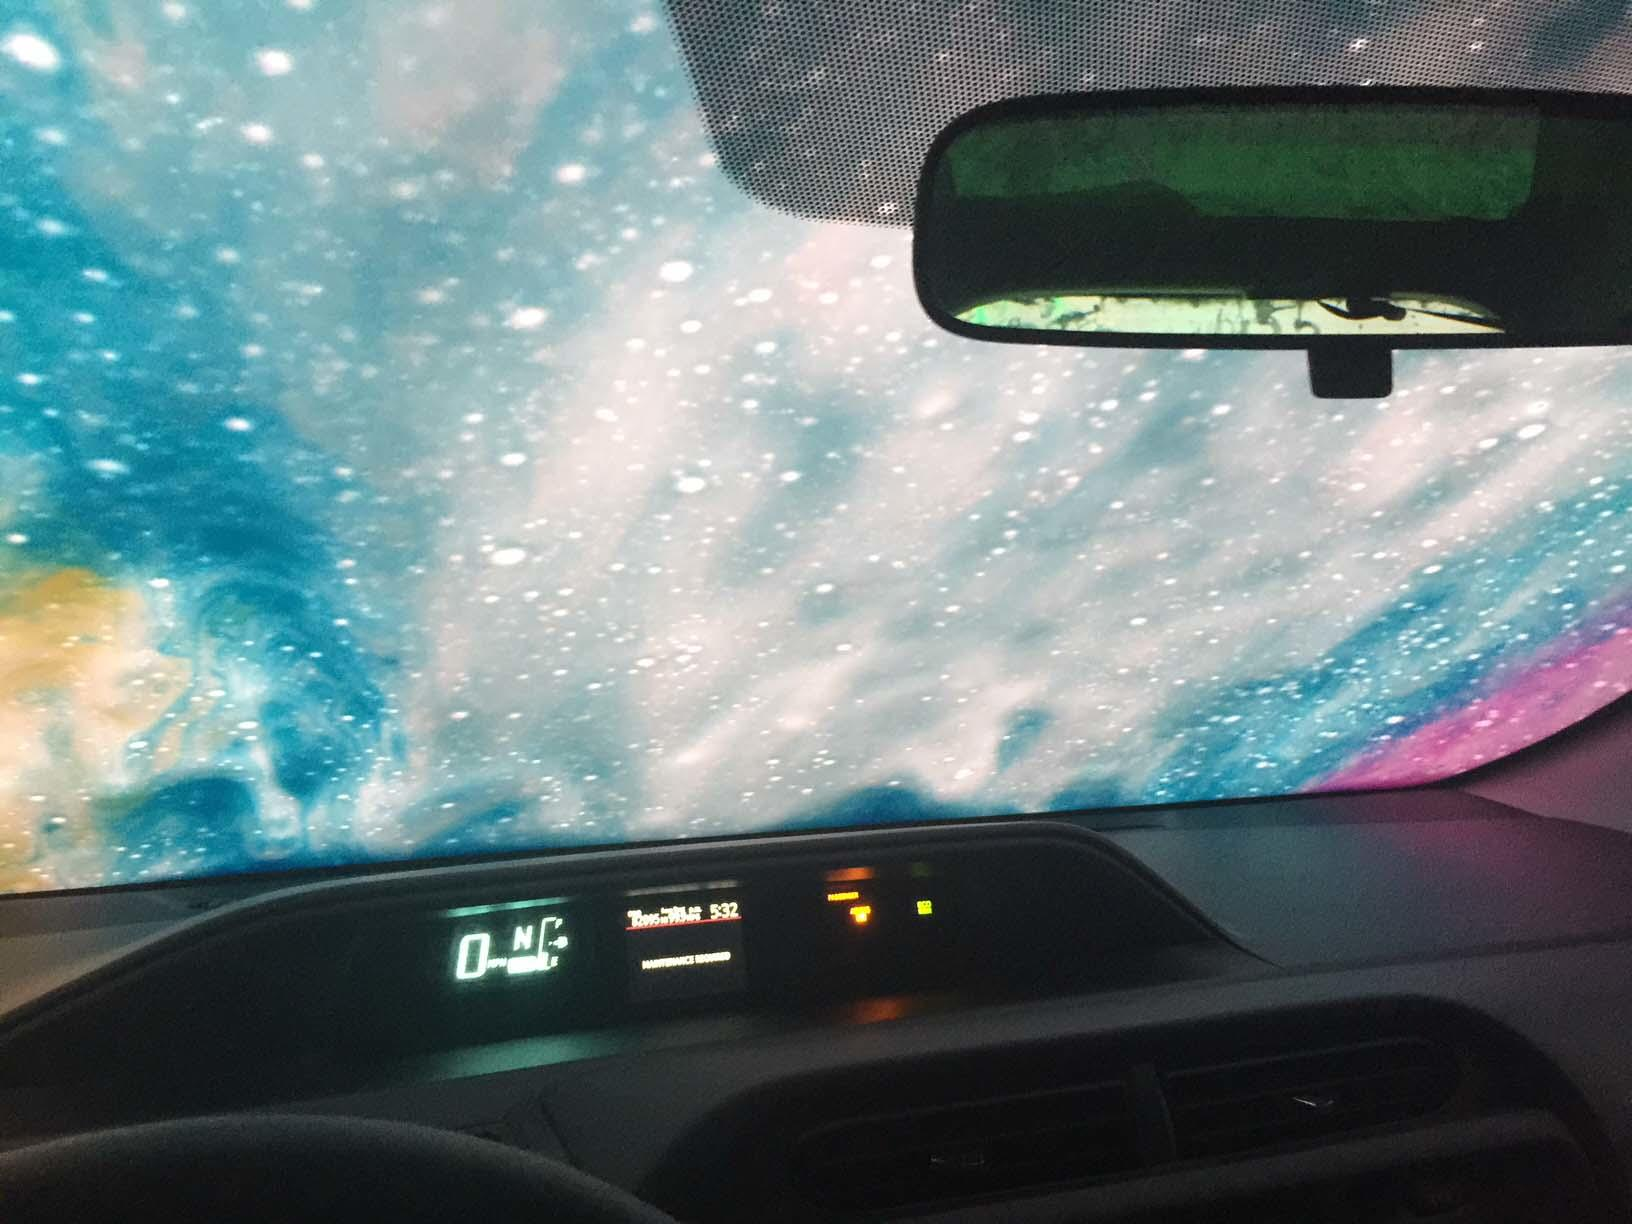 Quick N Clean Car Wash - PHOENIX AZ